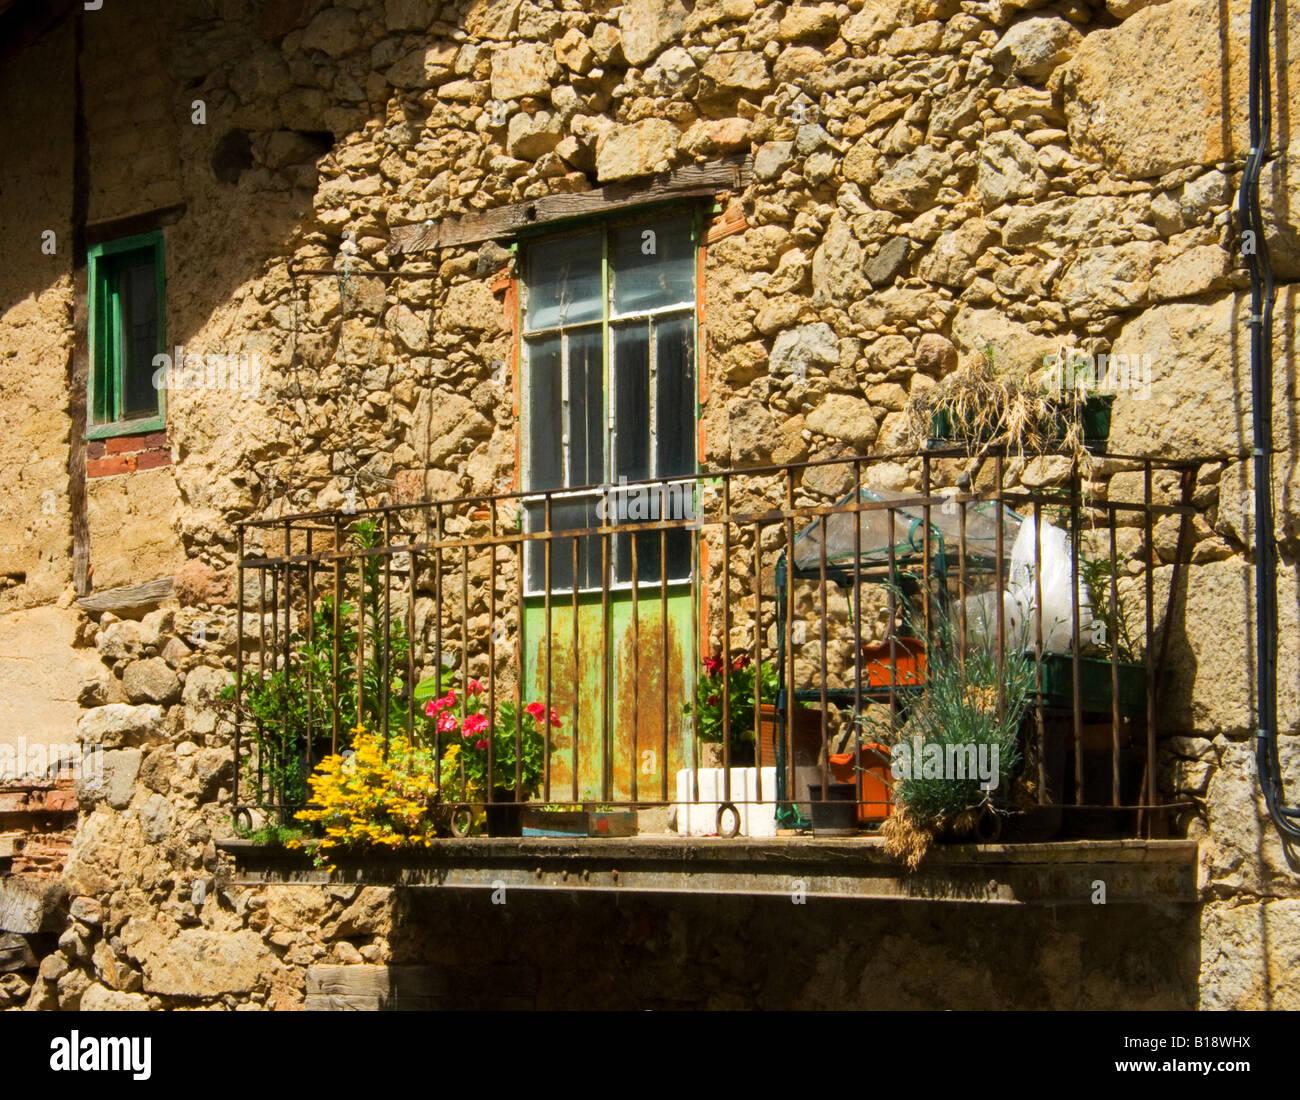 Balcony - Stock Image